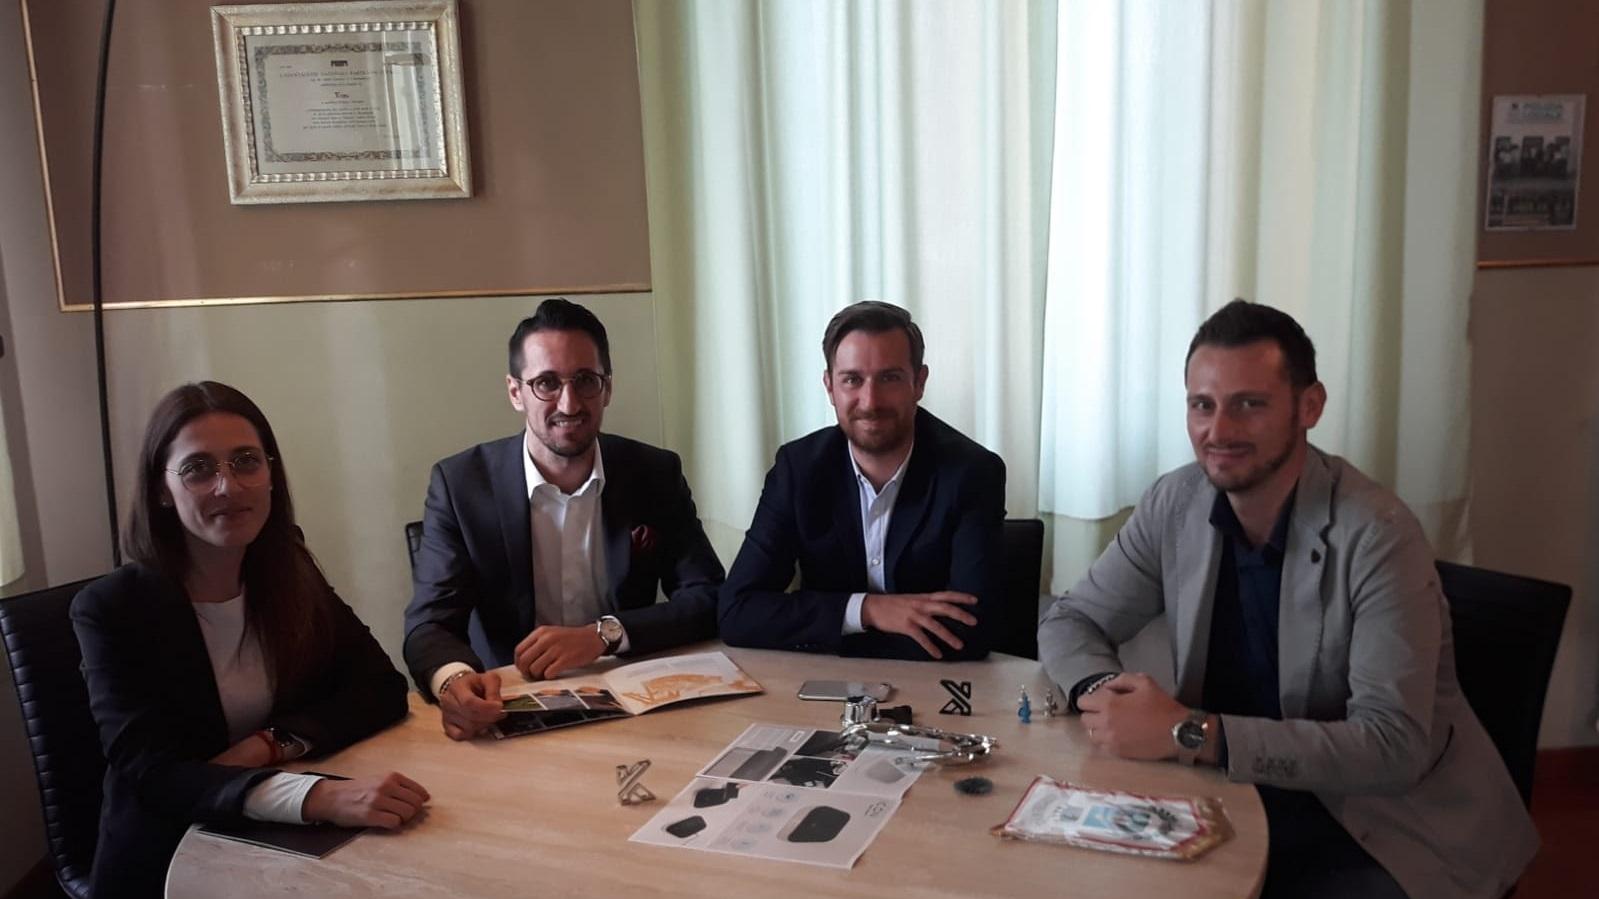 KREA Italy Matteo Gambioli con Sindaco di Trecastelli - KreaItaly, Stampa 3d - Stampanti 3d Marche - Stampanti 3D prezzi - Aziende stampa 3d